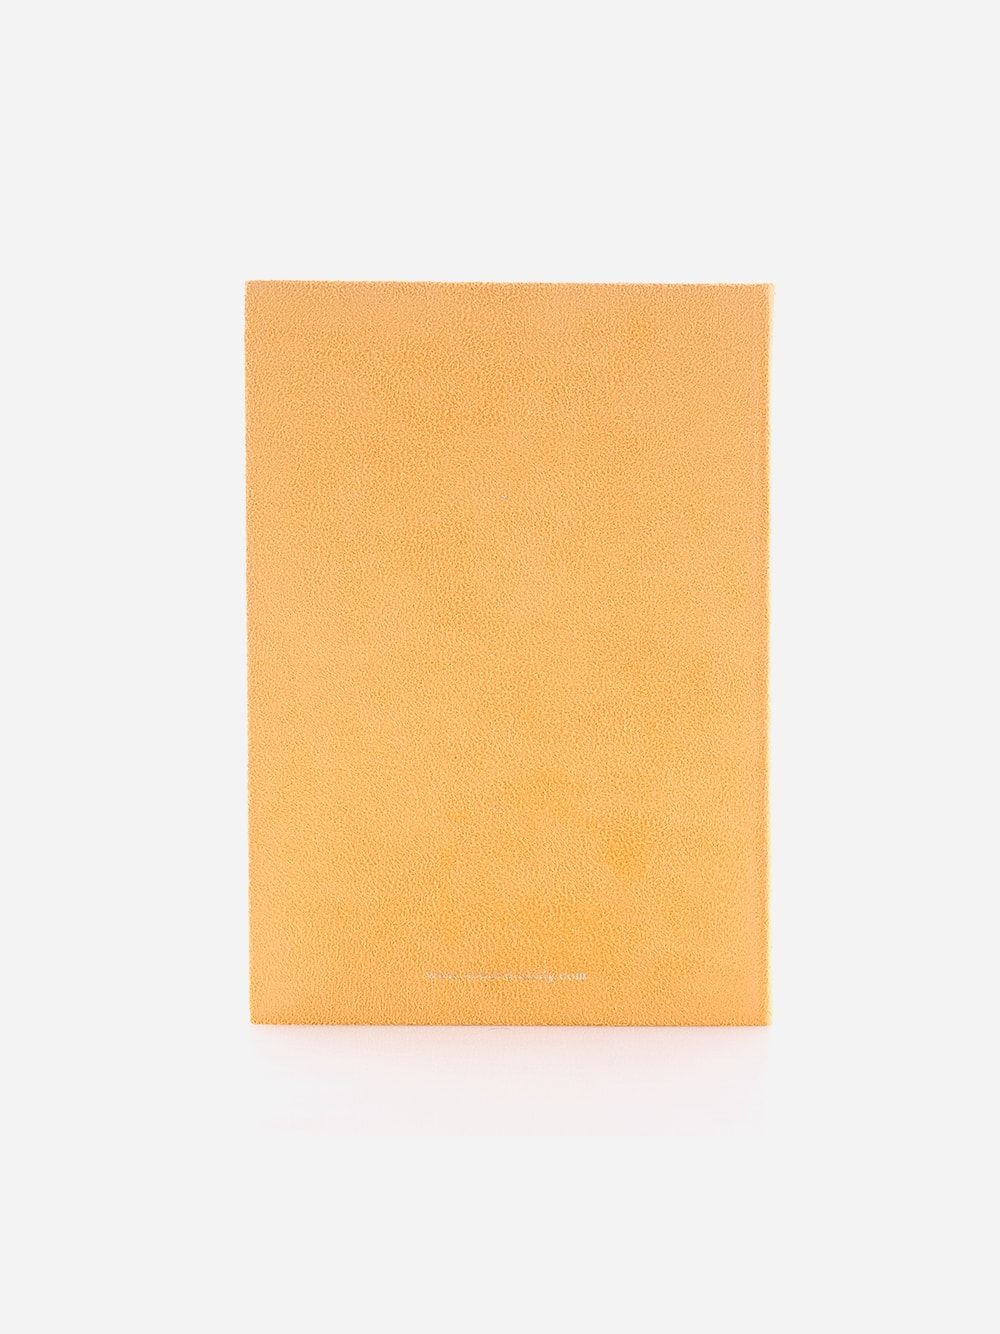 Sahara Notebook | Fine & Candy